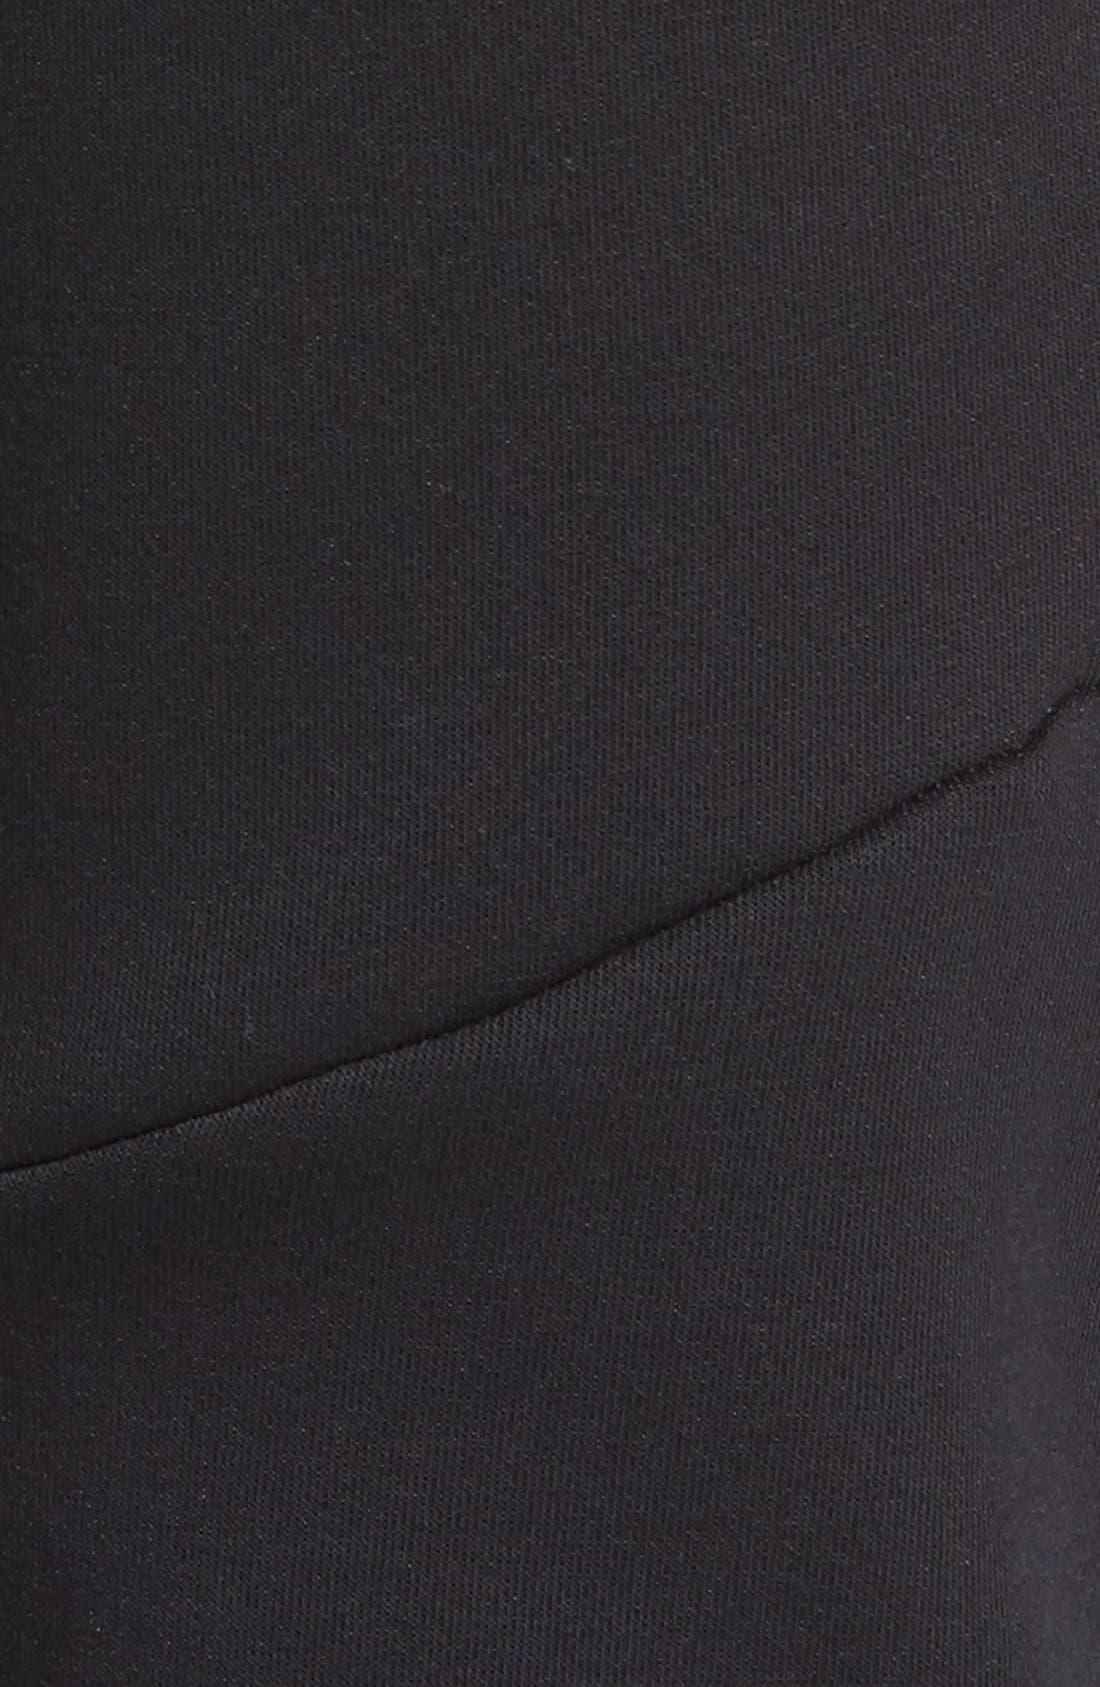 Tech Fleece Jogger Pants,                             Alternate thumbnail 6, color,                             Black/ Black